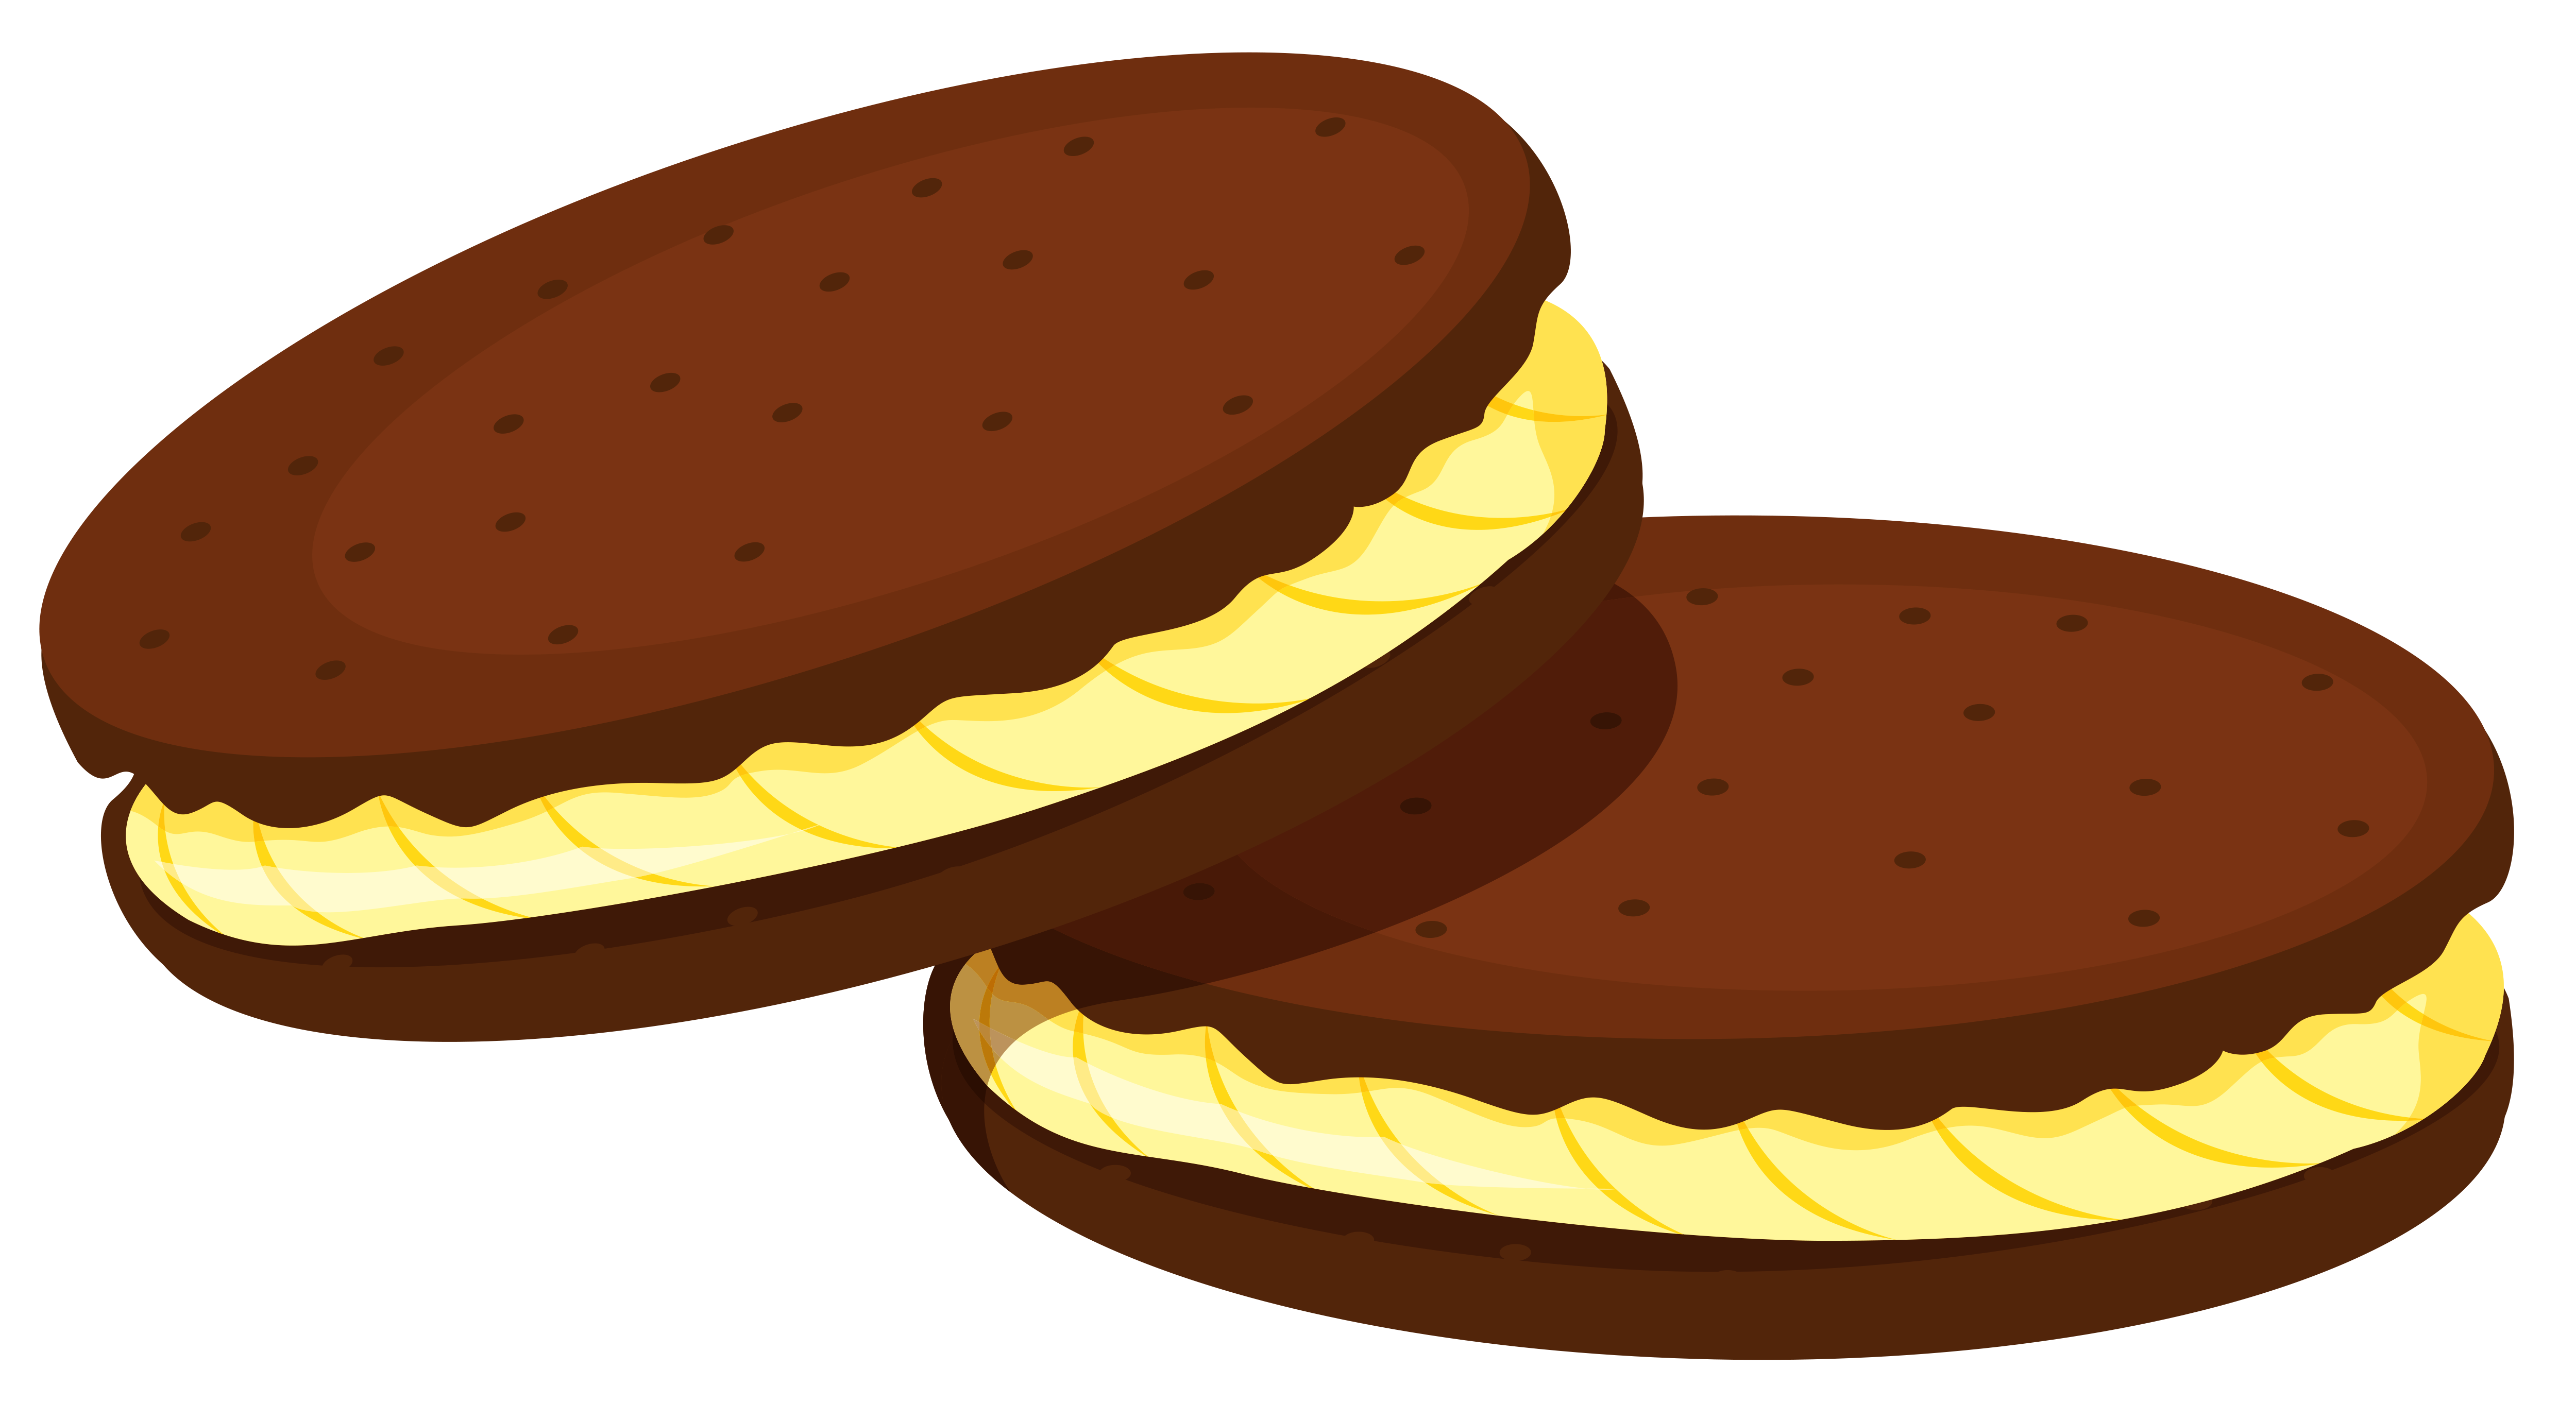 Cookies clipart cookie platter. Cocoa sandwich biscuit png